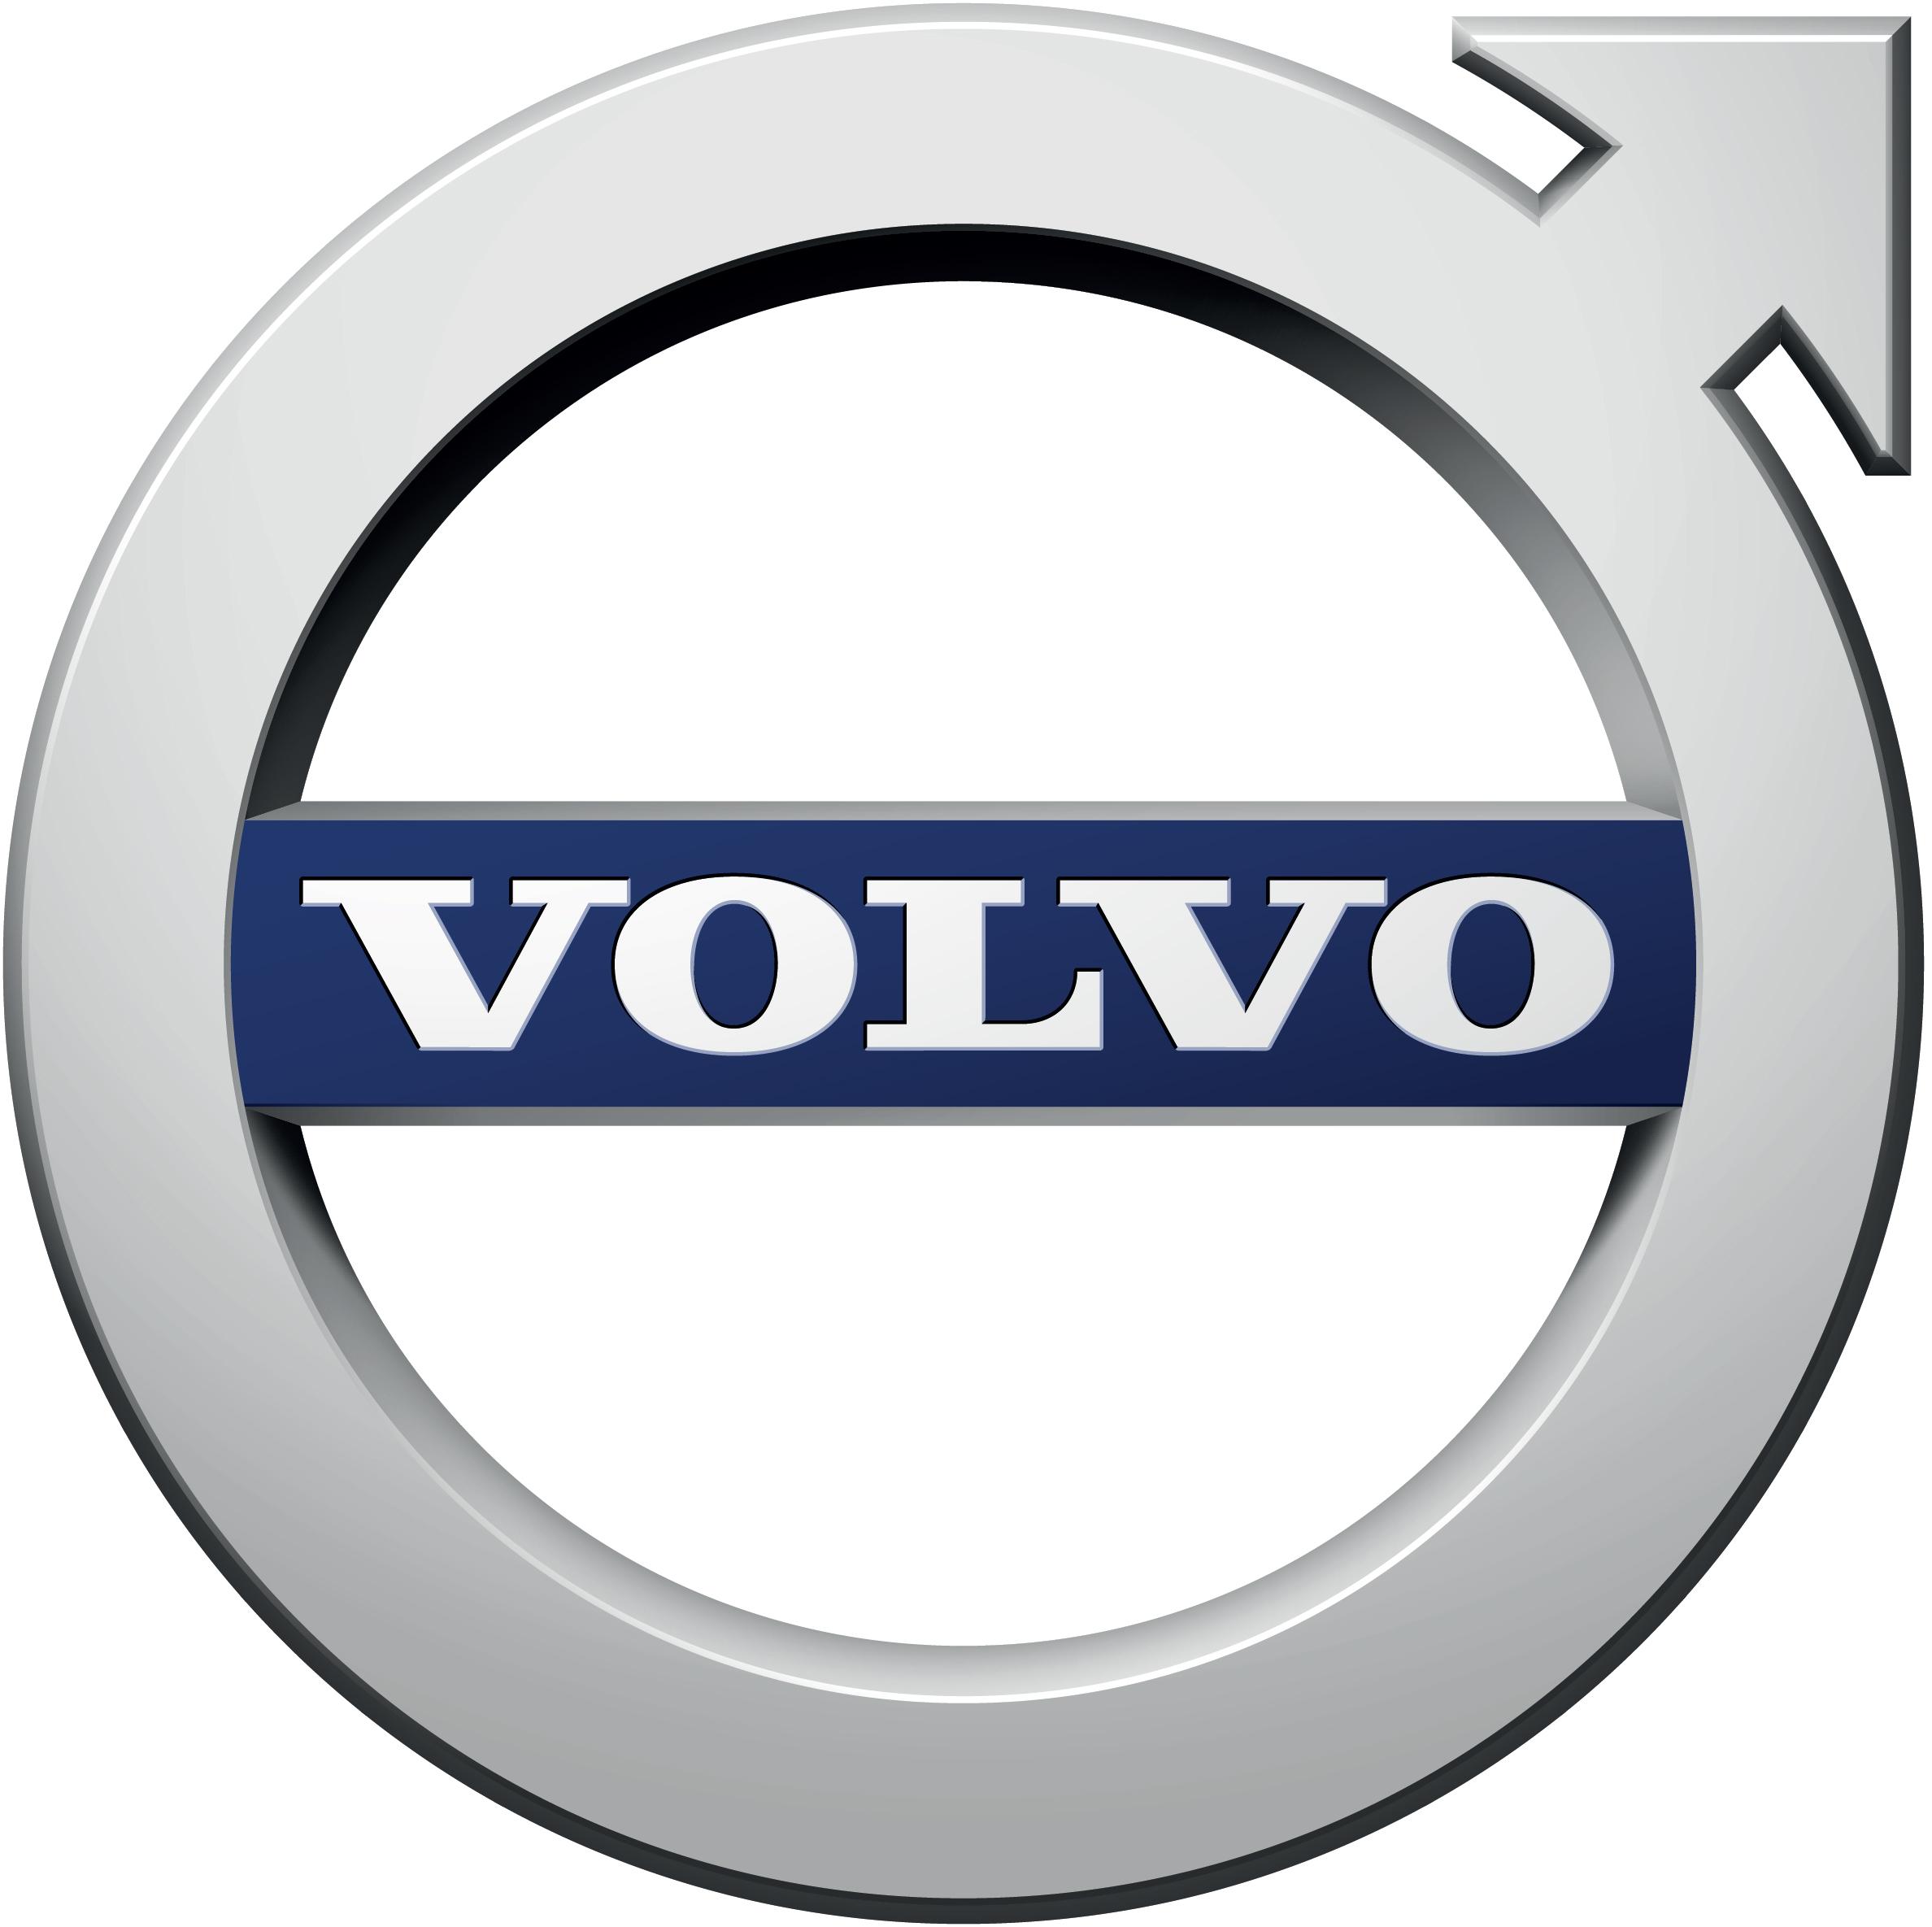 151241_Volvo_Logos_-_Iron_Mark_RGB_2014.jpg